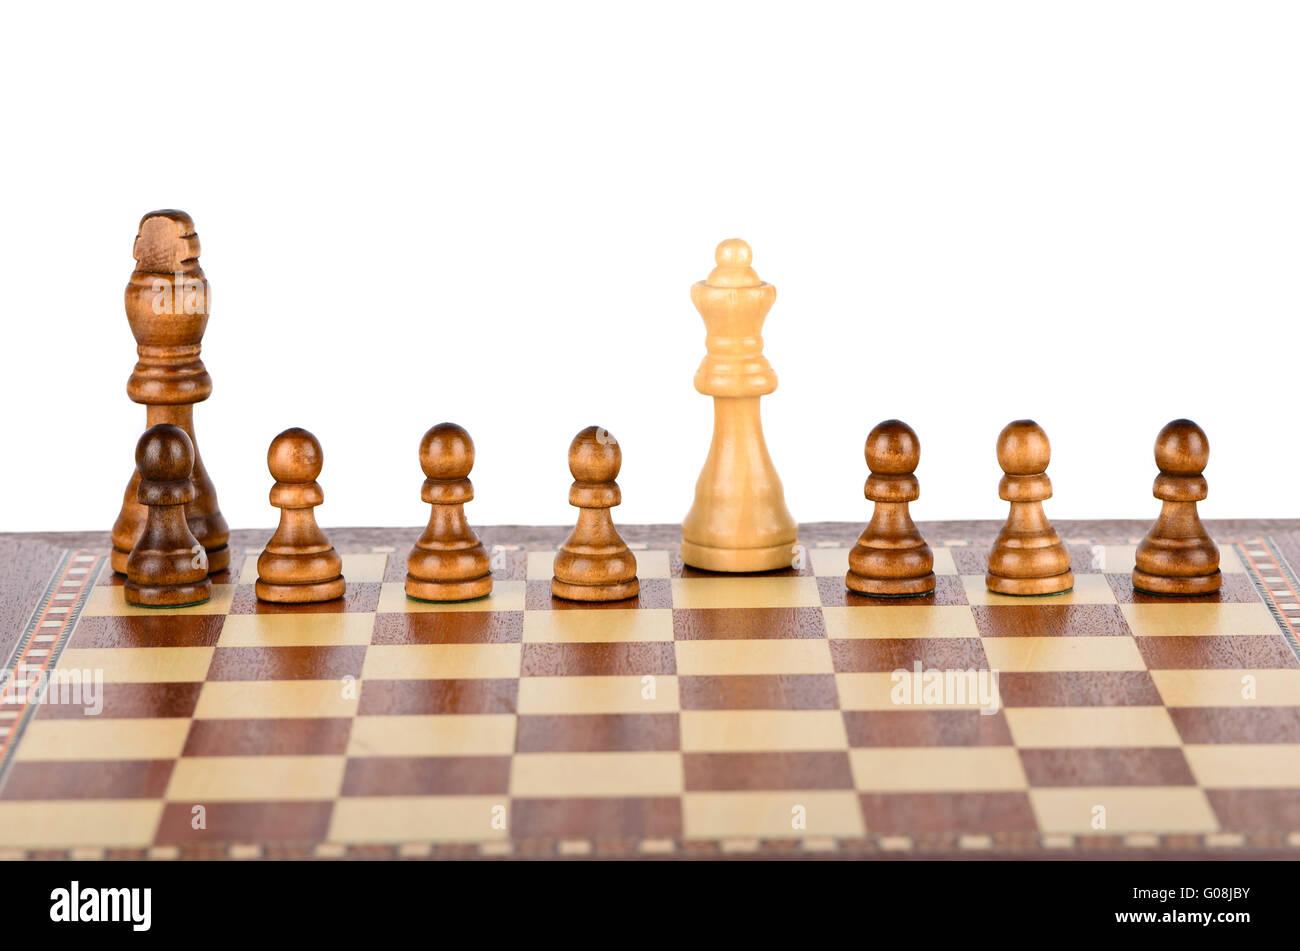 Checkmate the black king - Stock Image